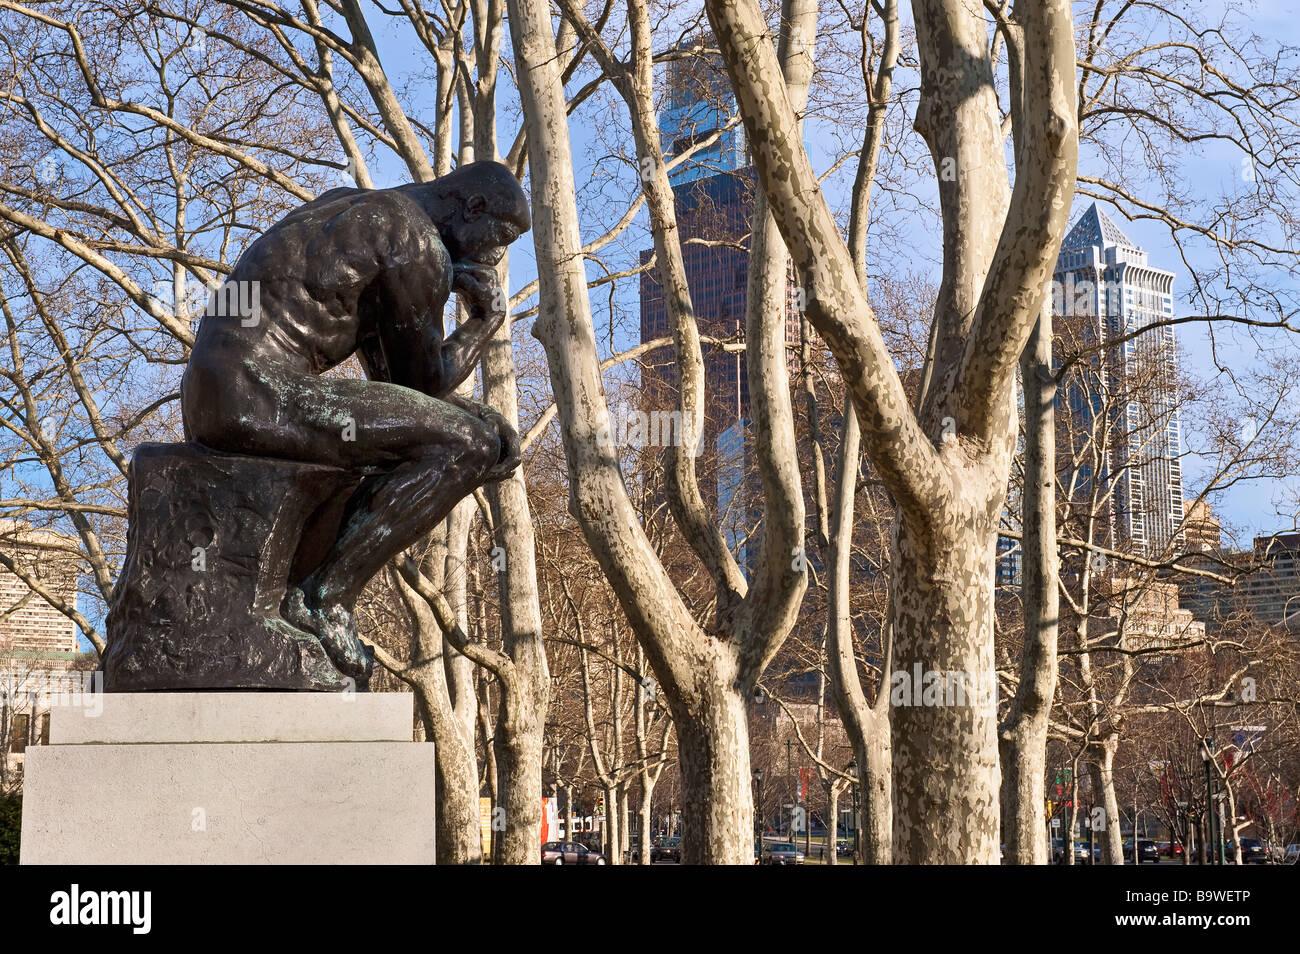 Rodin's 'The Thinker' sculpture Philadelphia Pennsylvania USA - Stock Image